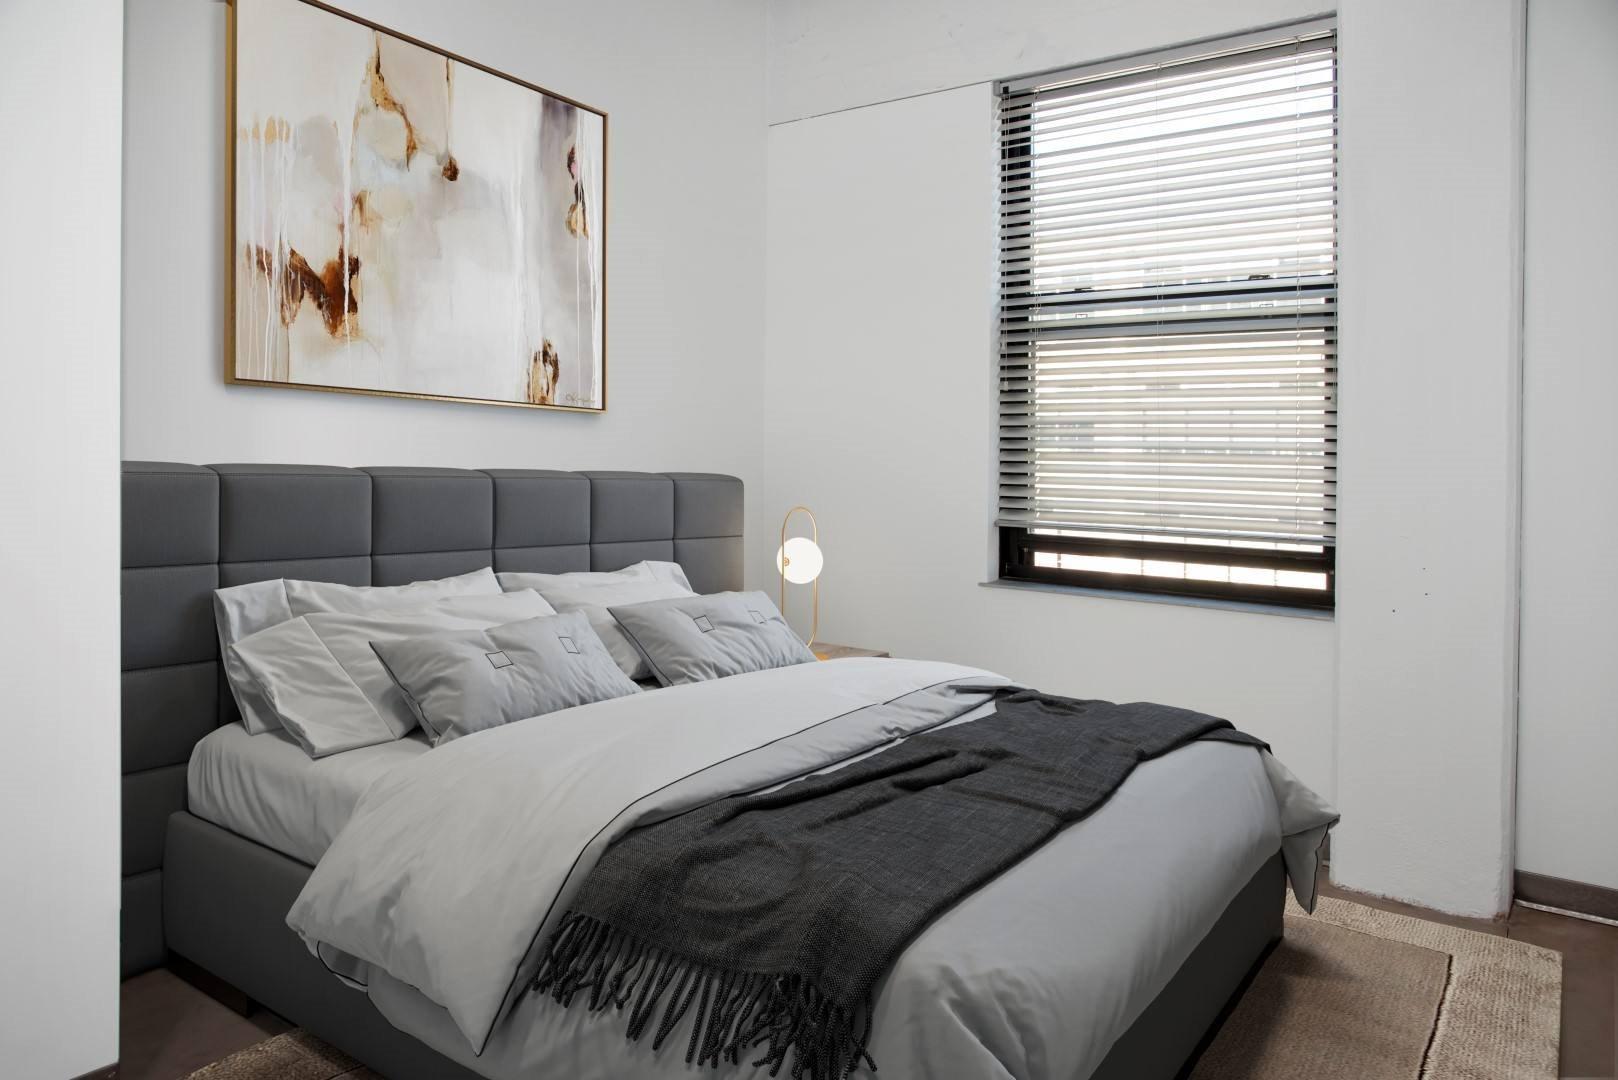 Gurley Lofts two bedroom